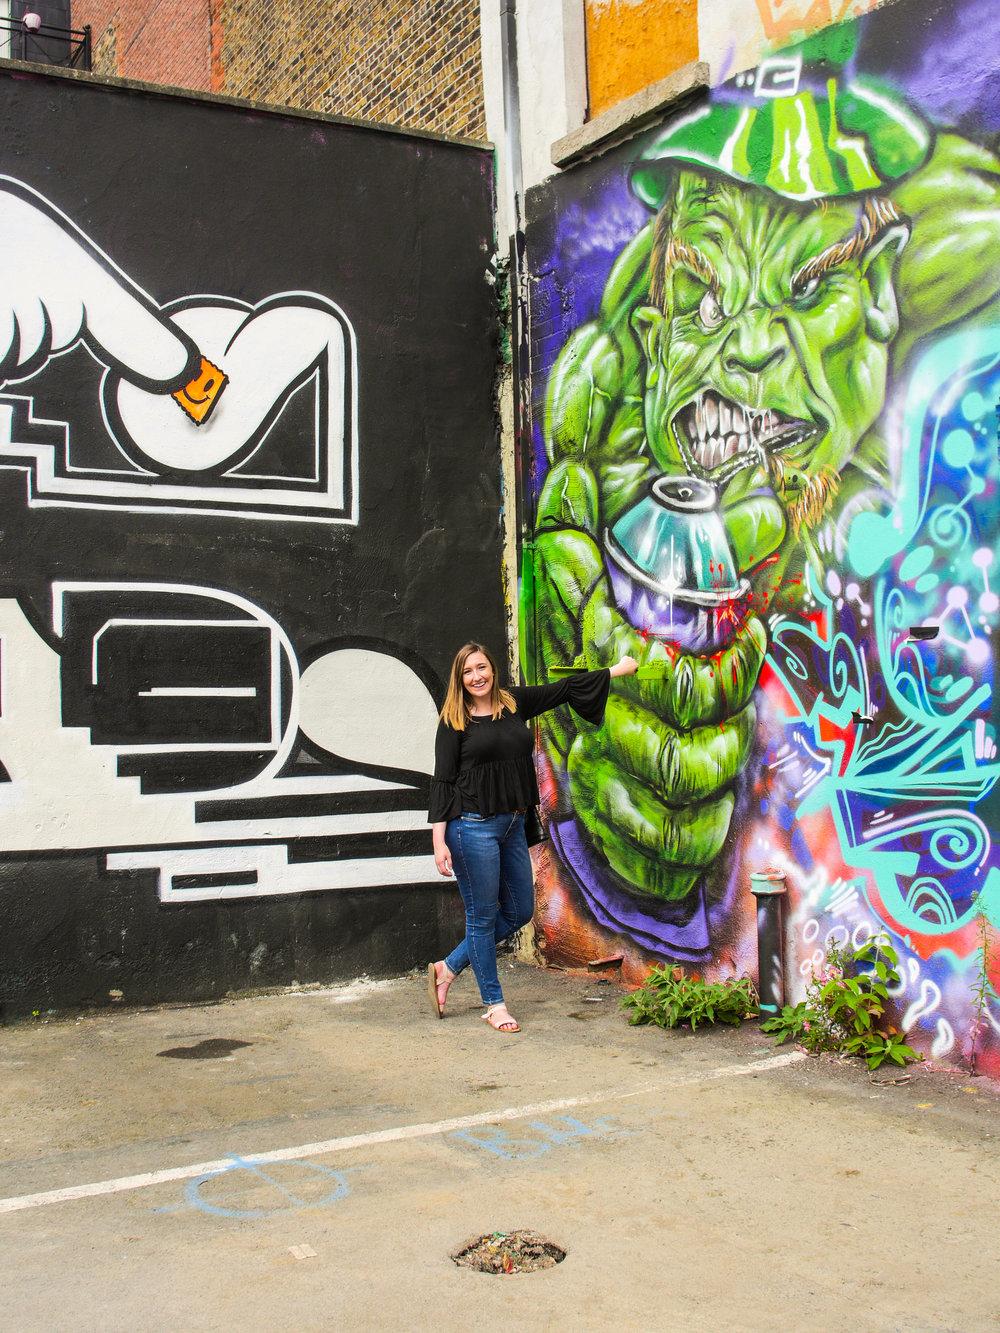 Candid Alexandra with street art at Tivoli Theatre in Dublin, Ireland